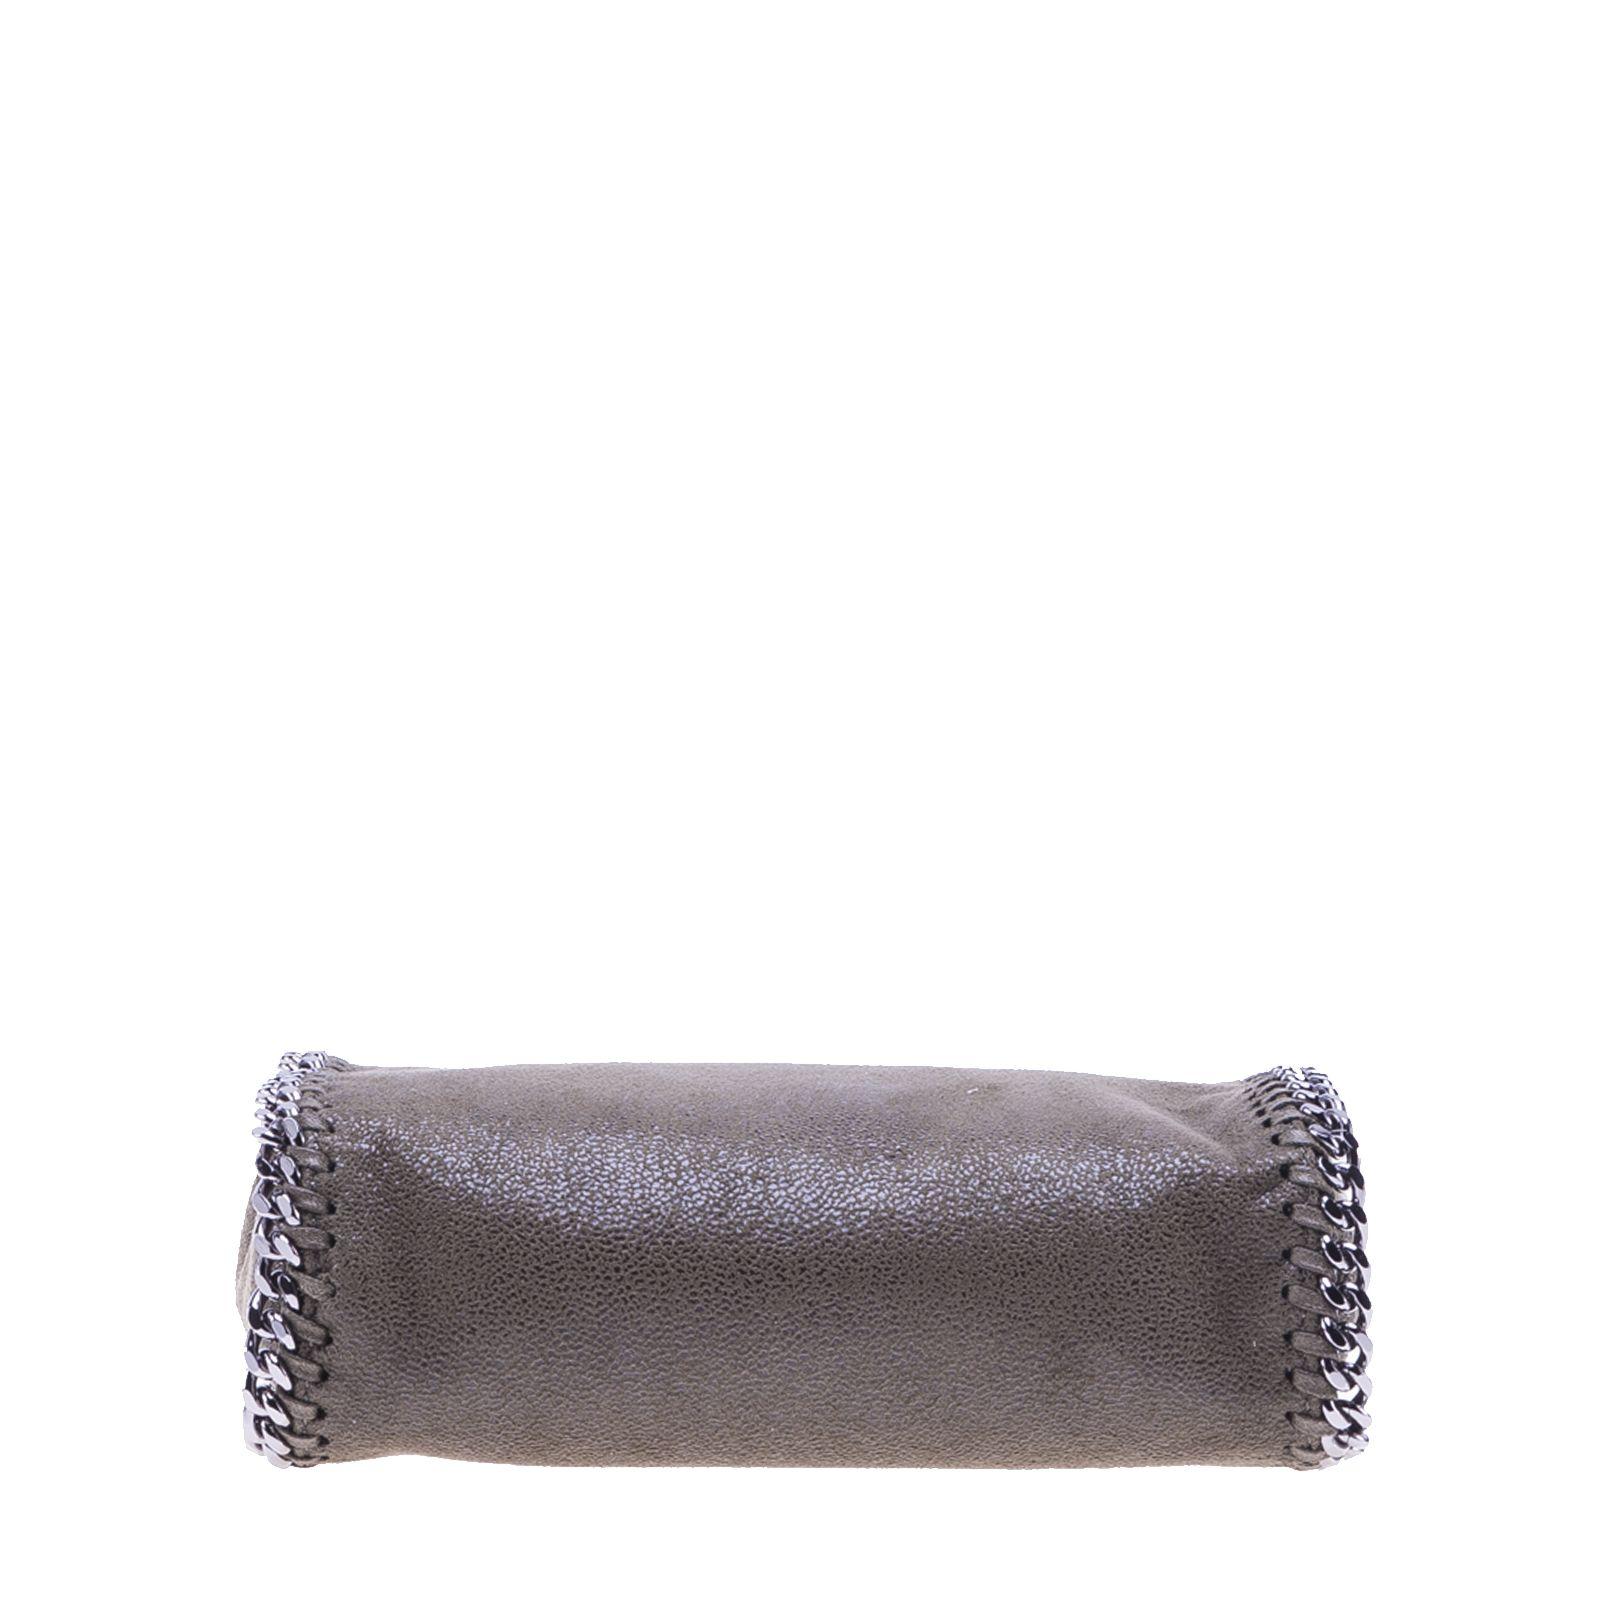 stella mccartney stella mccartney mini falabella tote 391698w91323200 women 39 s bags italist. Black Bedroom Furniture Sets. Home Design Ideas